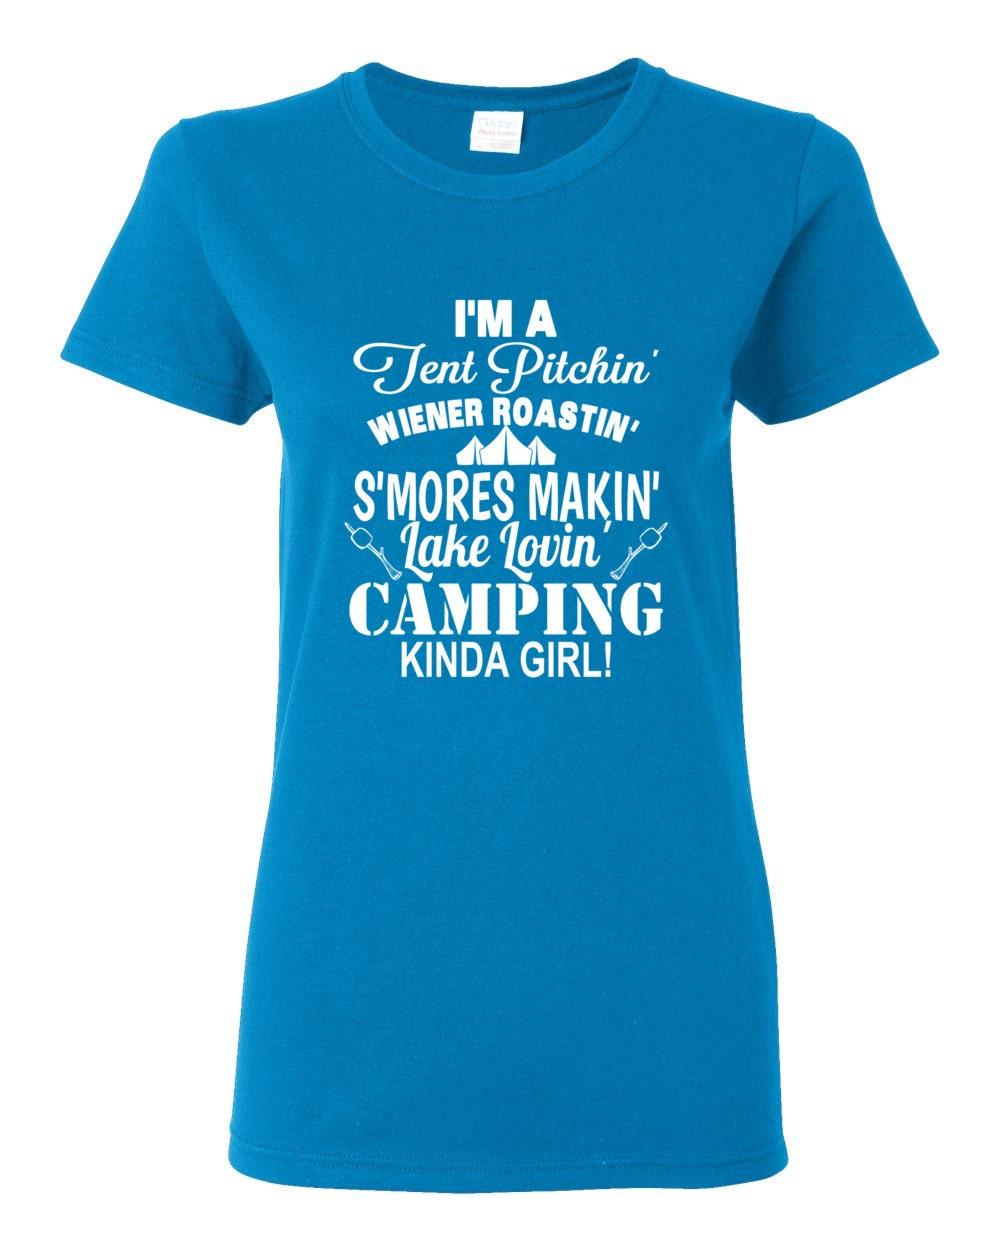 Camping T-shirt - Camping Kinda Girl Womens T-shirt